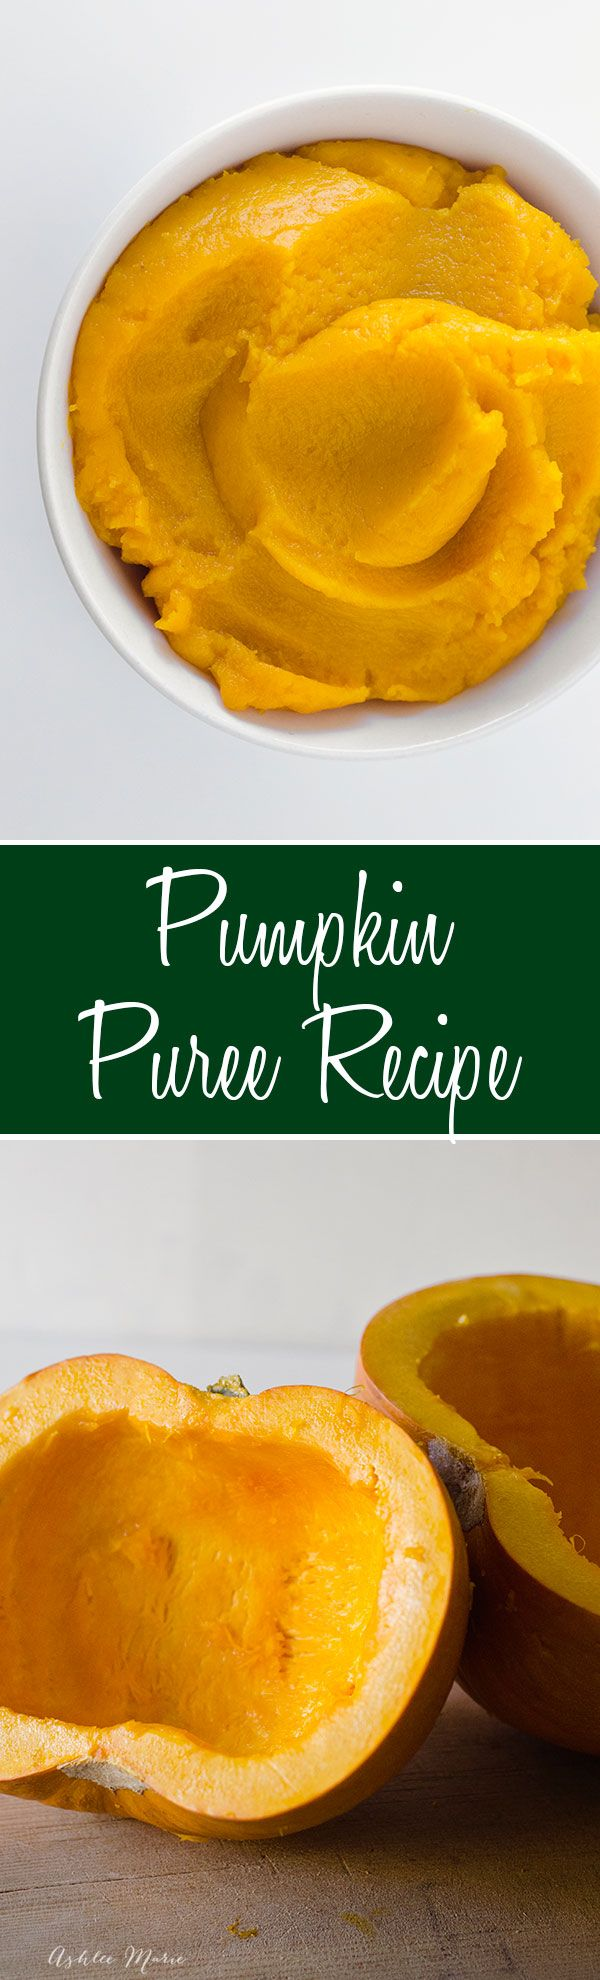 how to easily make your own homemade pumpkin puree